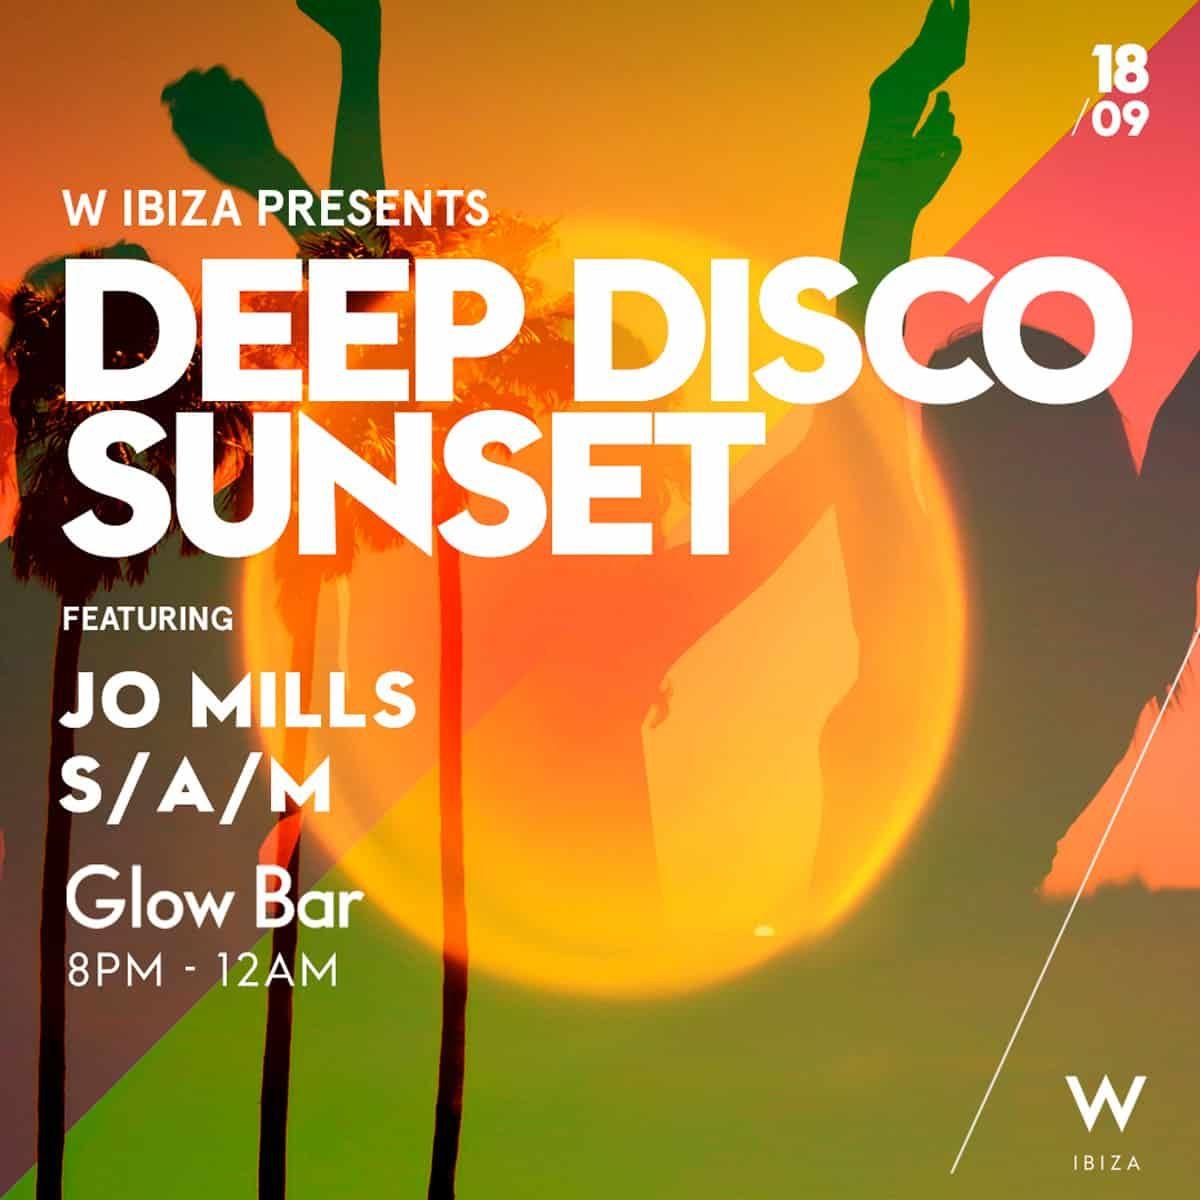 deep-disco-sunset-glow-bar-w-ibiza-2021-welcometoibiza